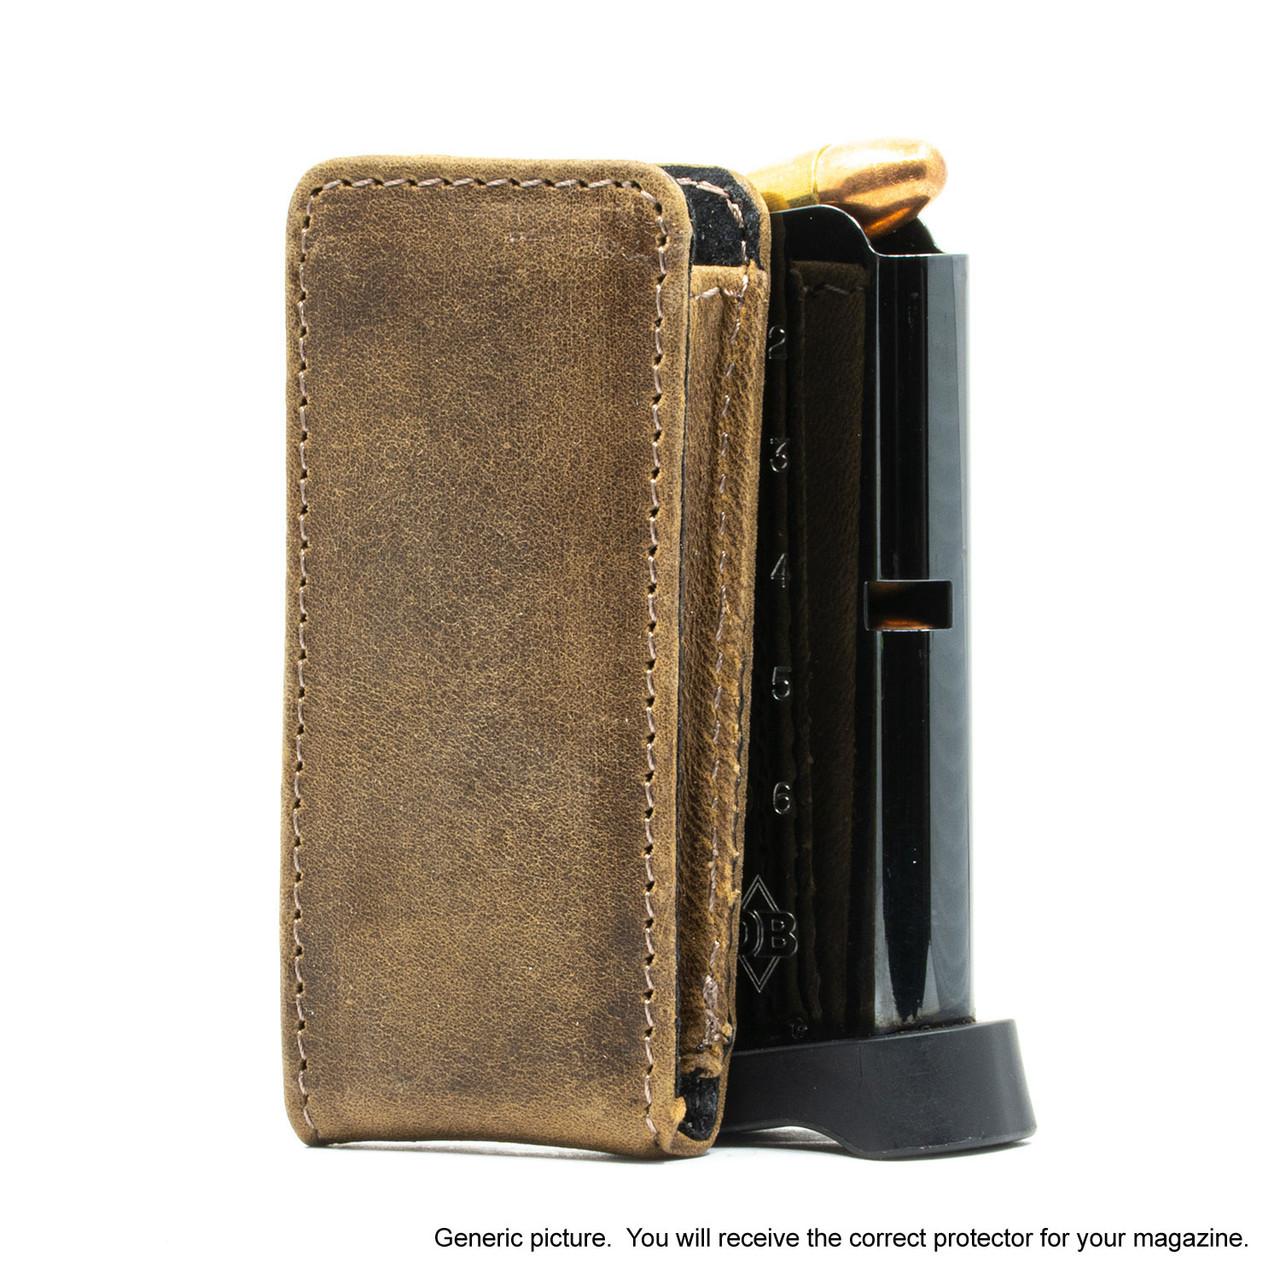 Taurus G2S Brown Freedom Magazine Pocket Protector